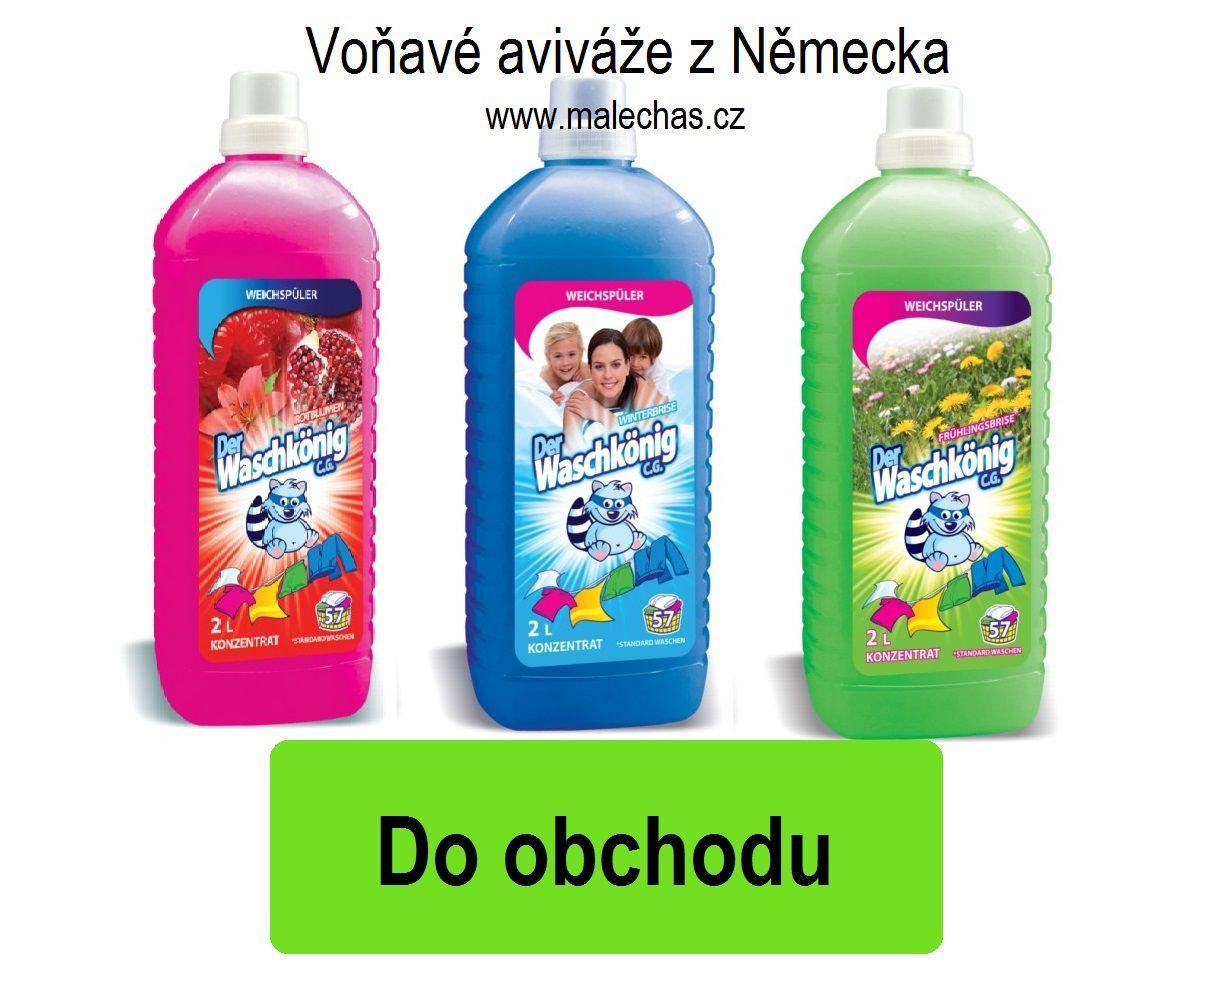 b_avivaze_waschkonig